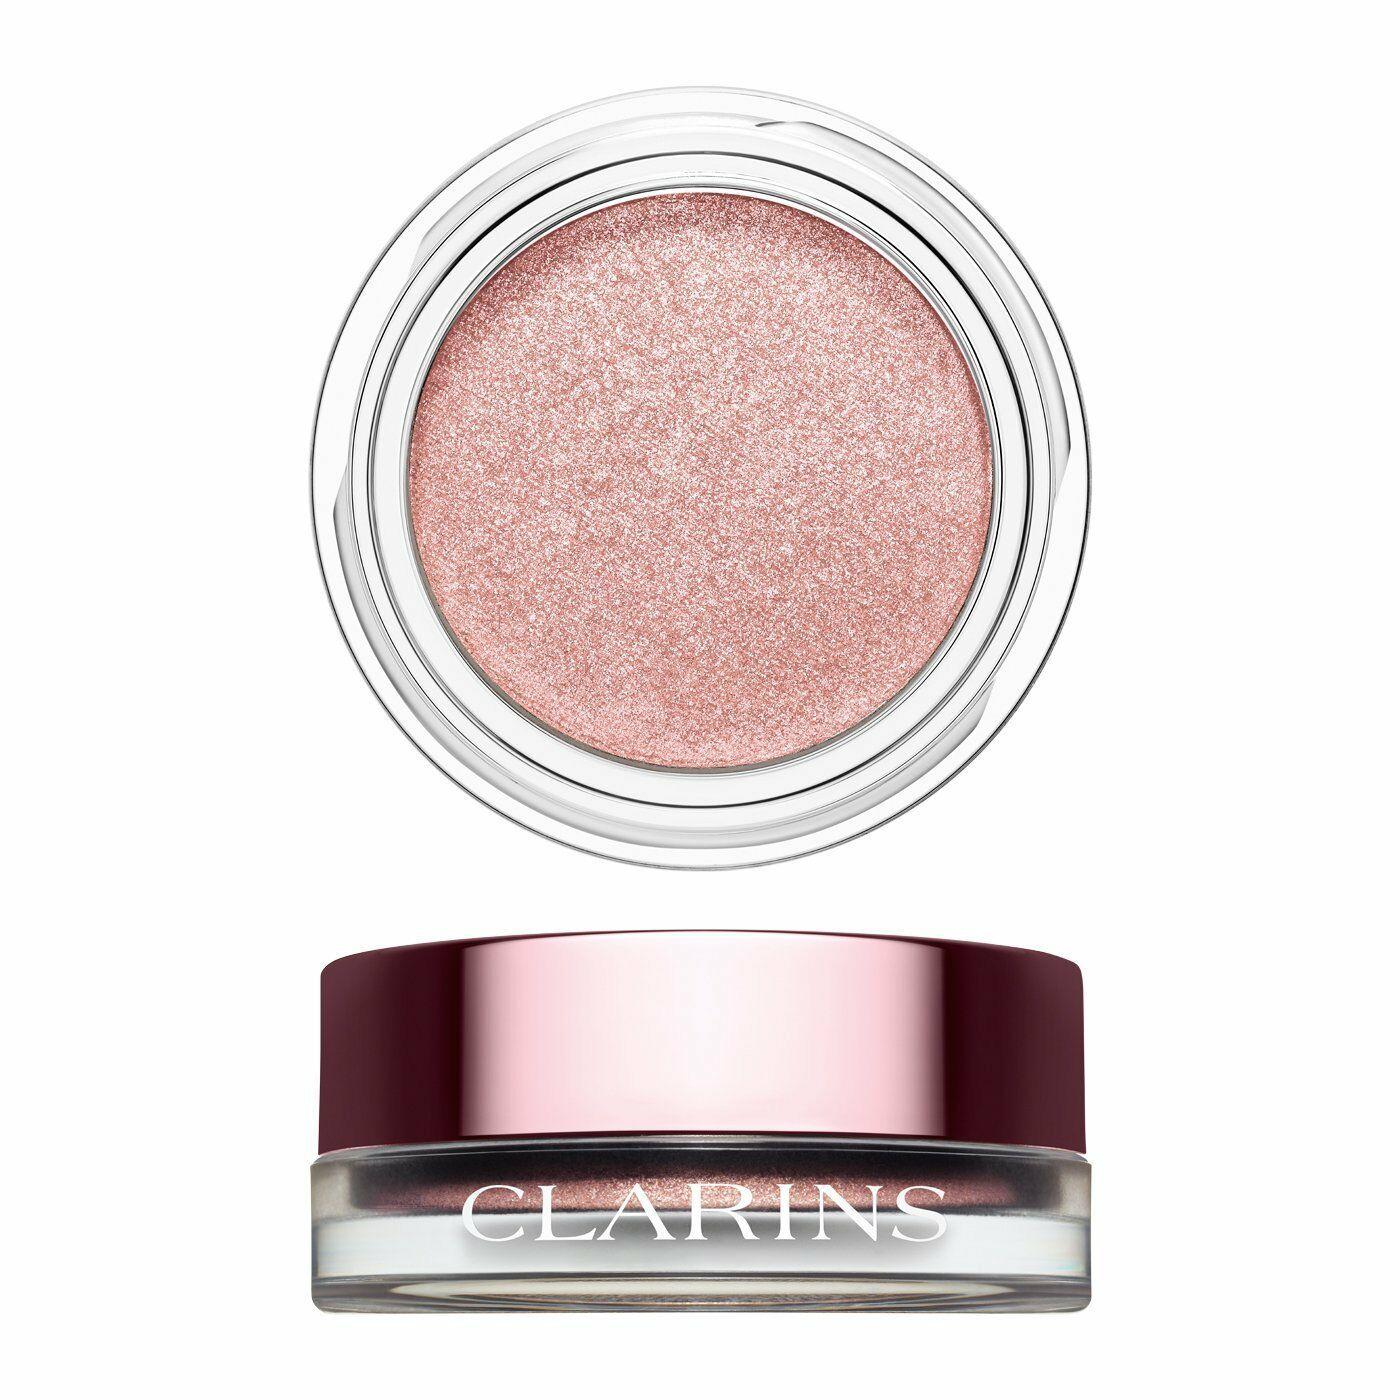 CLARINS Ombre IRIDESCENT CREAM to POWDER Eye Shadow SILVER ROSE Shimmer 09 NIB - $20.92